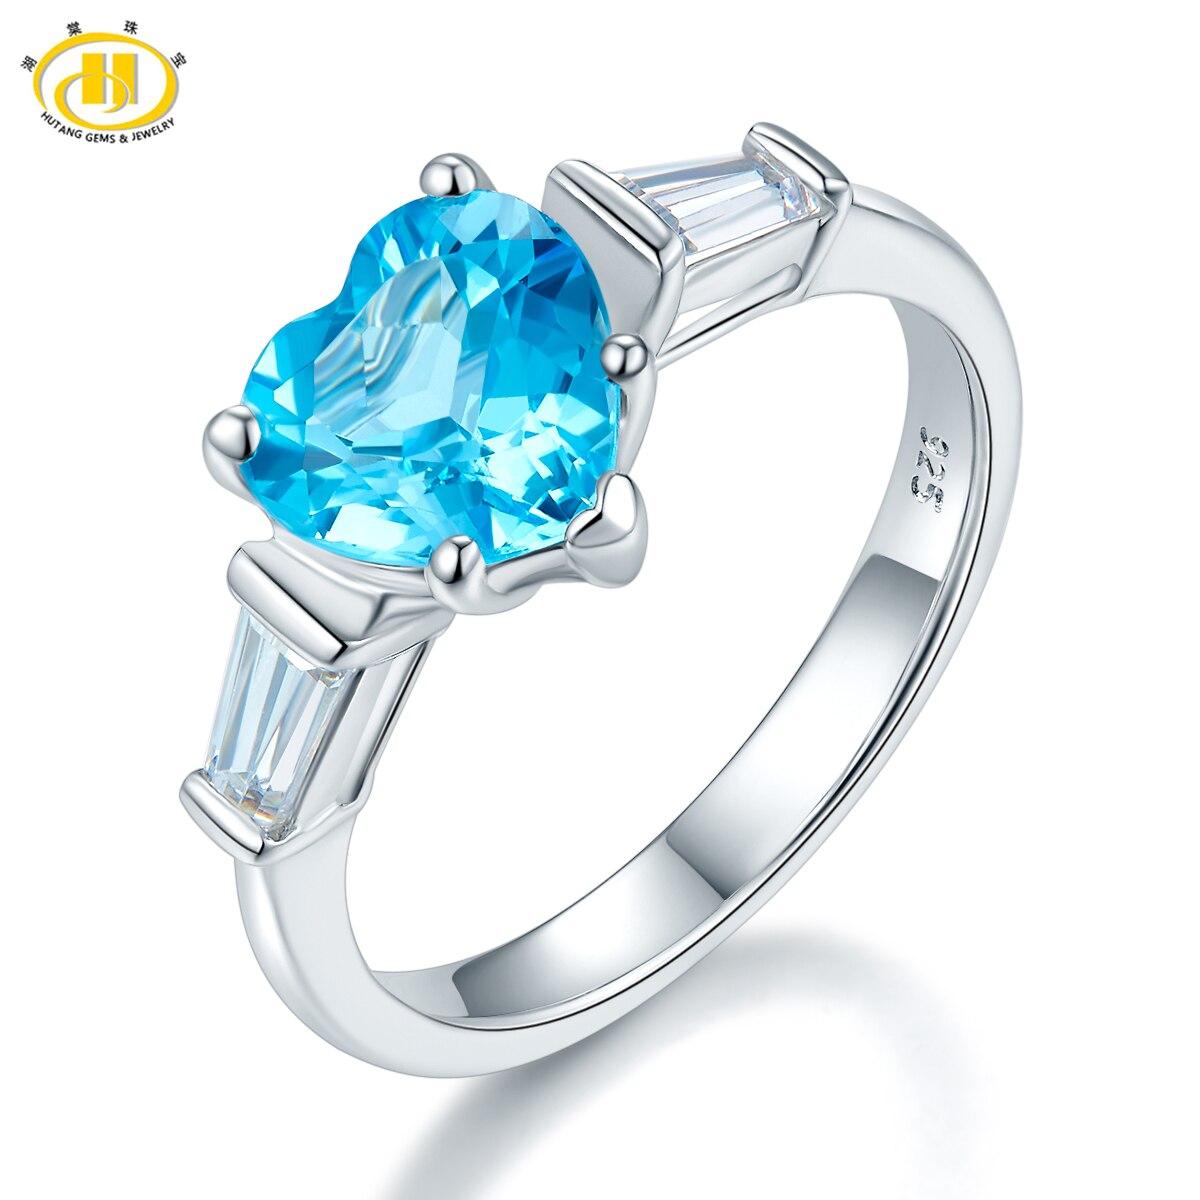 Здесь можно купить  Hutang New Arrival Genuine Swisss Bule Topaz Heart Ring Solid 925 Sterling Silver Gemstone Jewelry Wedding Women Gift  Ювелирные изделия и часы